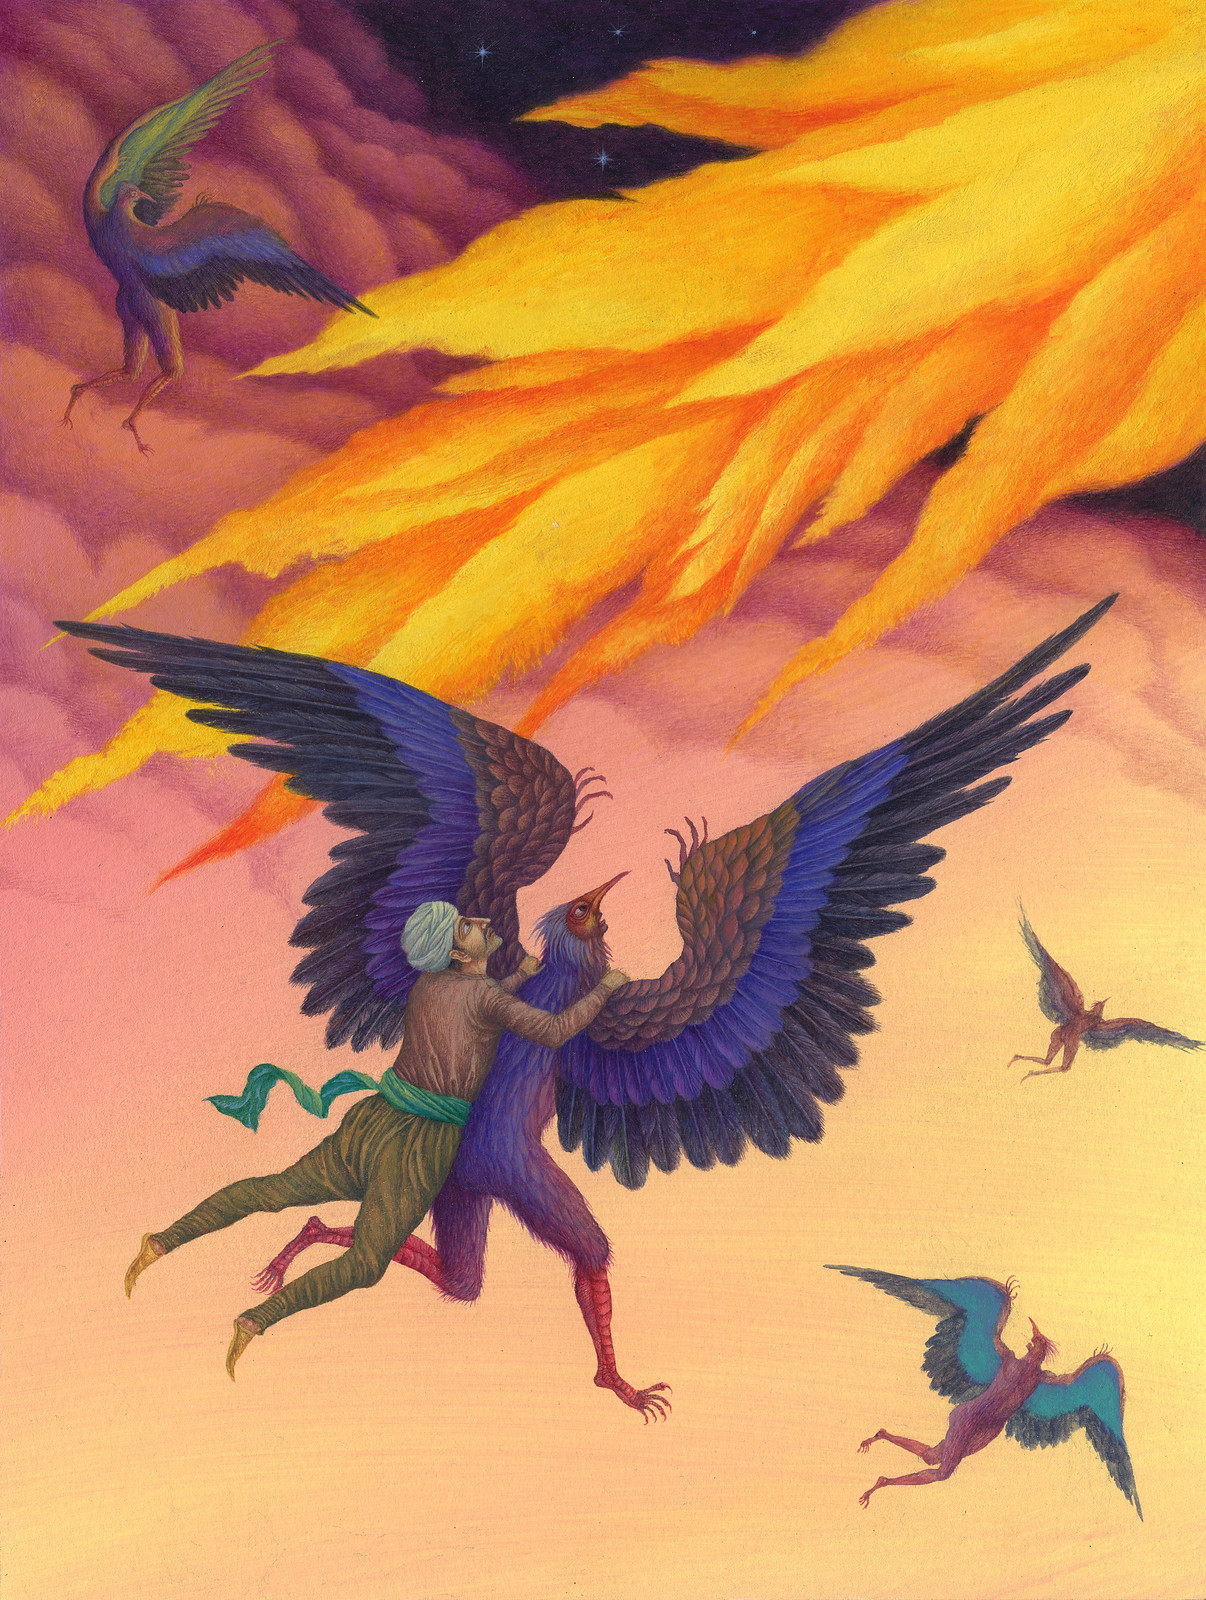 Jindra Capek - Athousand and One Nights, Illustration 1